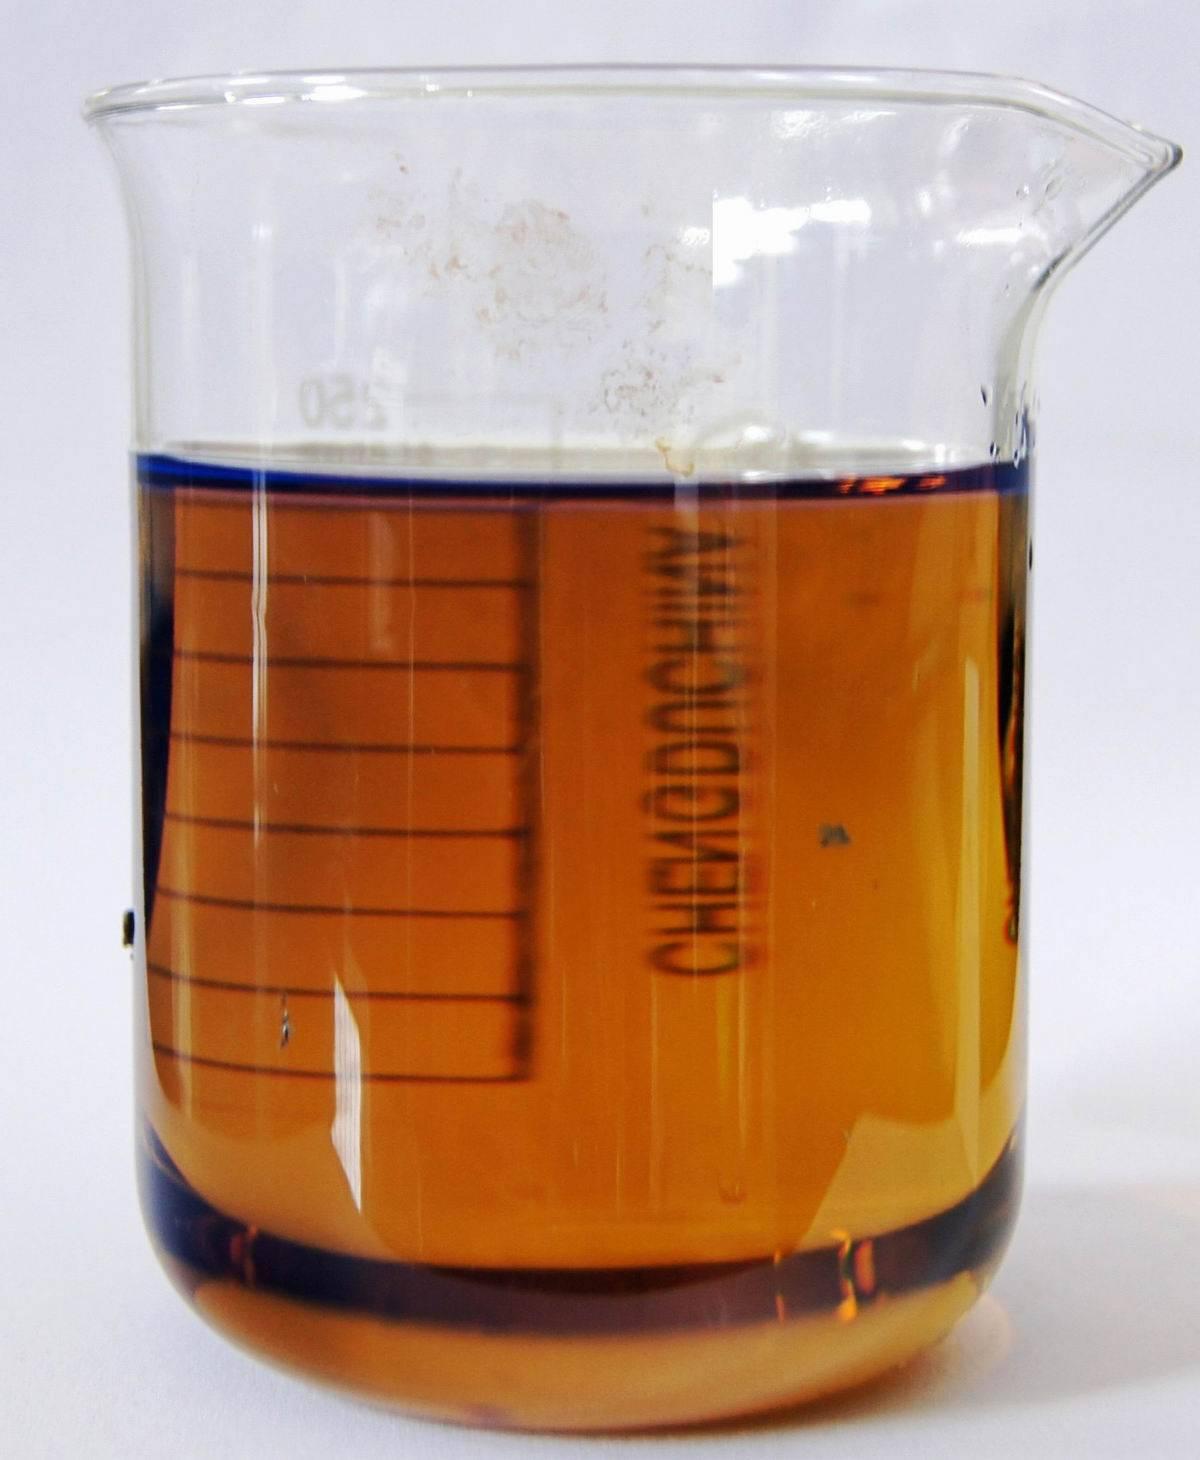 2-[(4-Chlorophenyl)(4-piperidinyloxy)methyl]pyridine (CAS 122368-54-1)